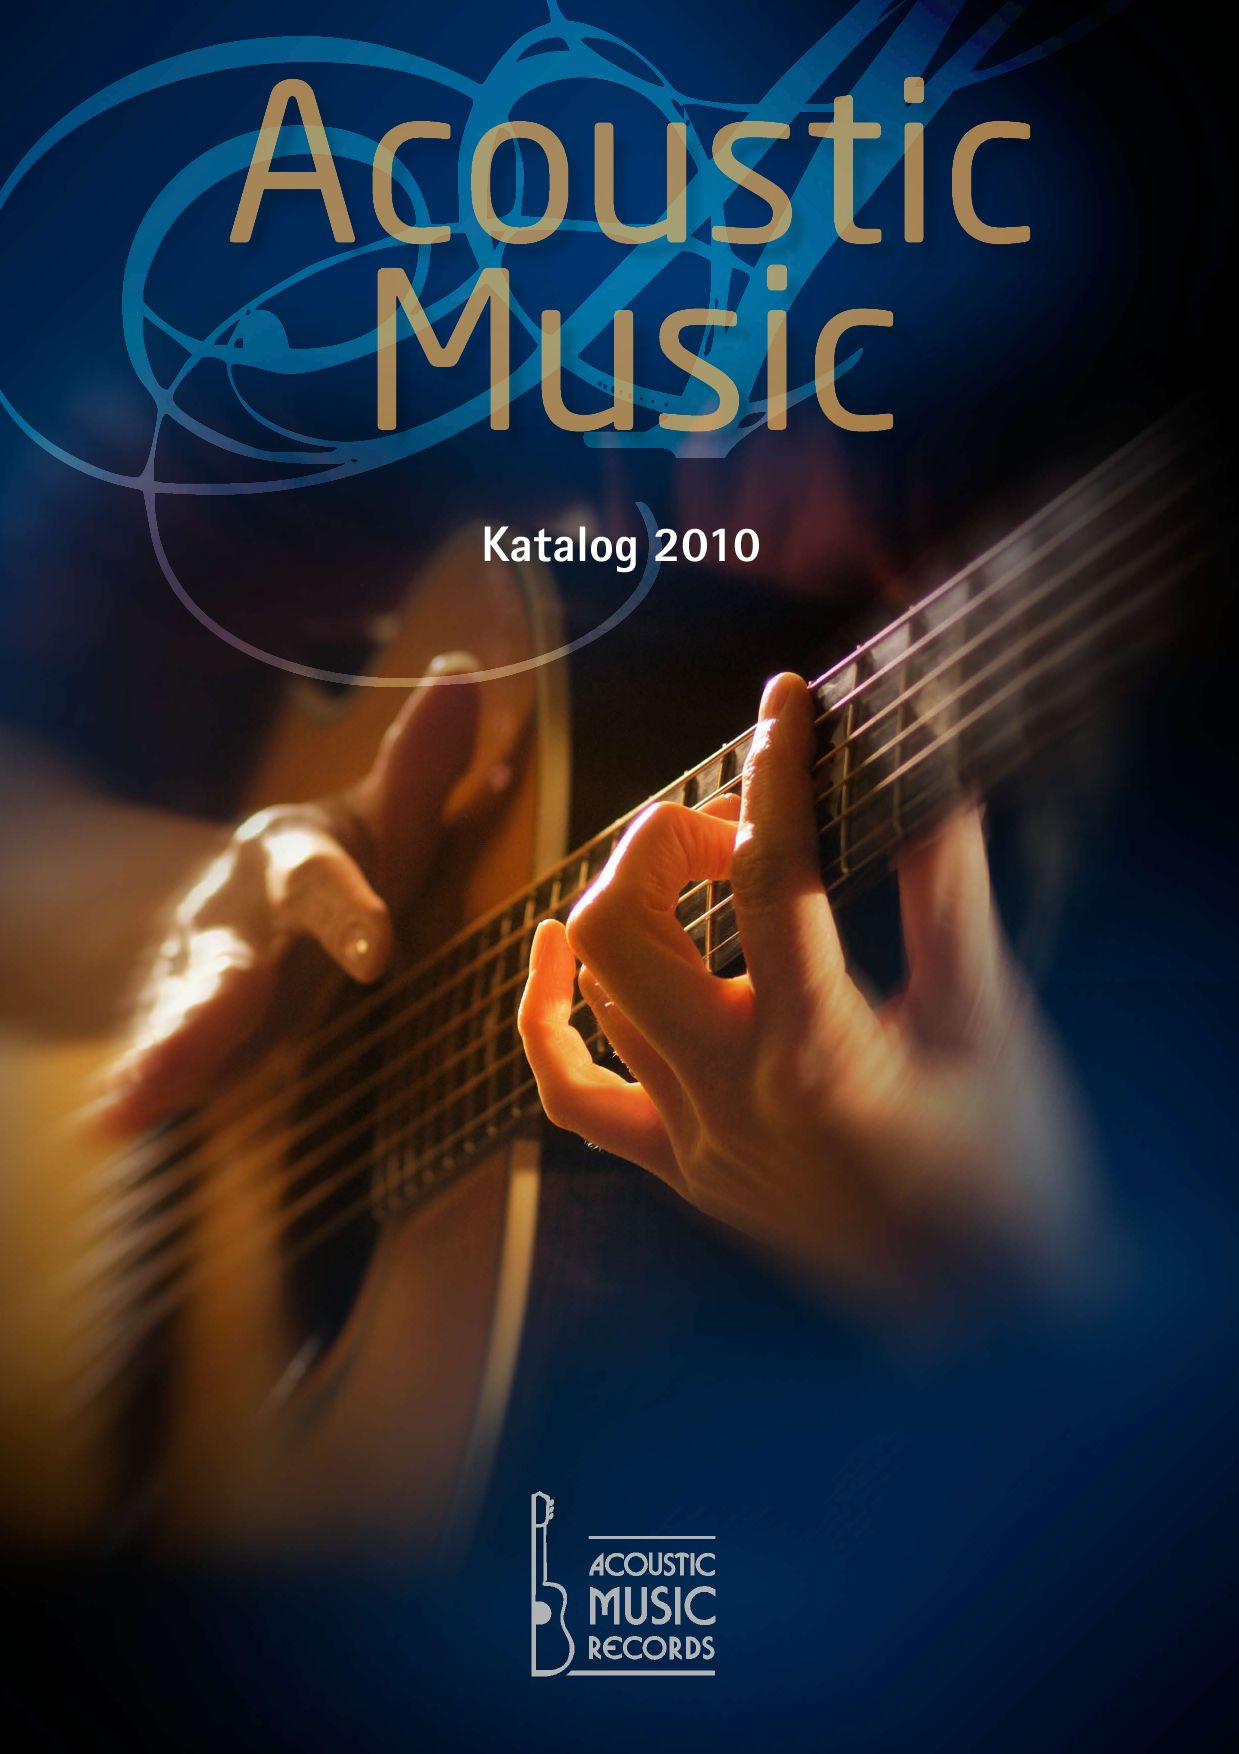 Acoustic Music Gesamtkatalog 2010 By Gerald Oppermann Issuu